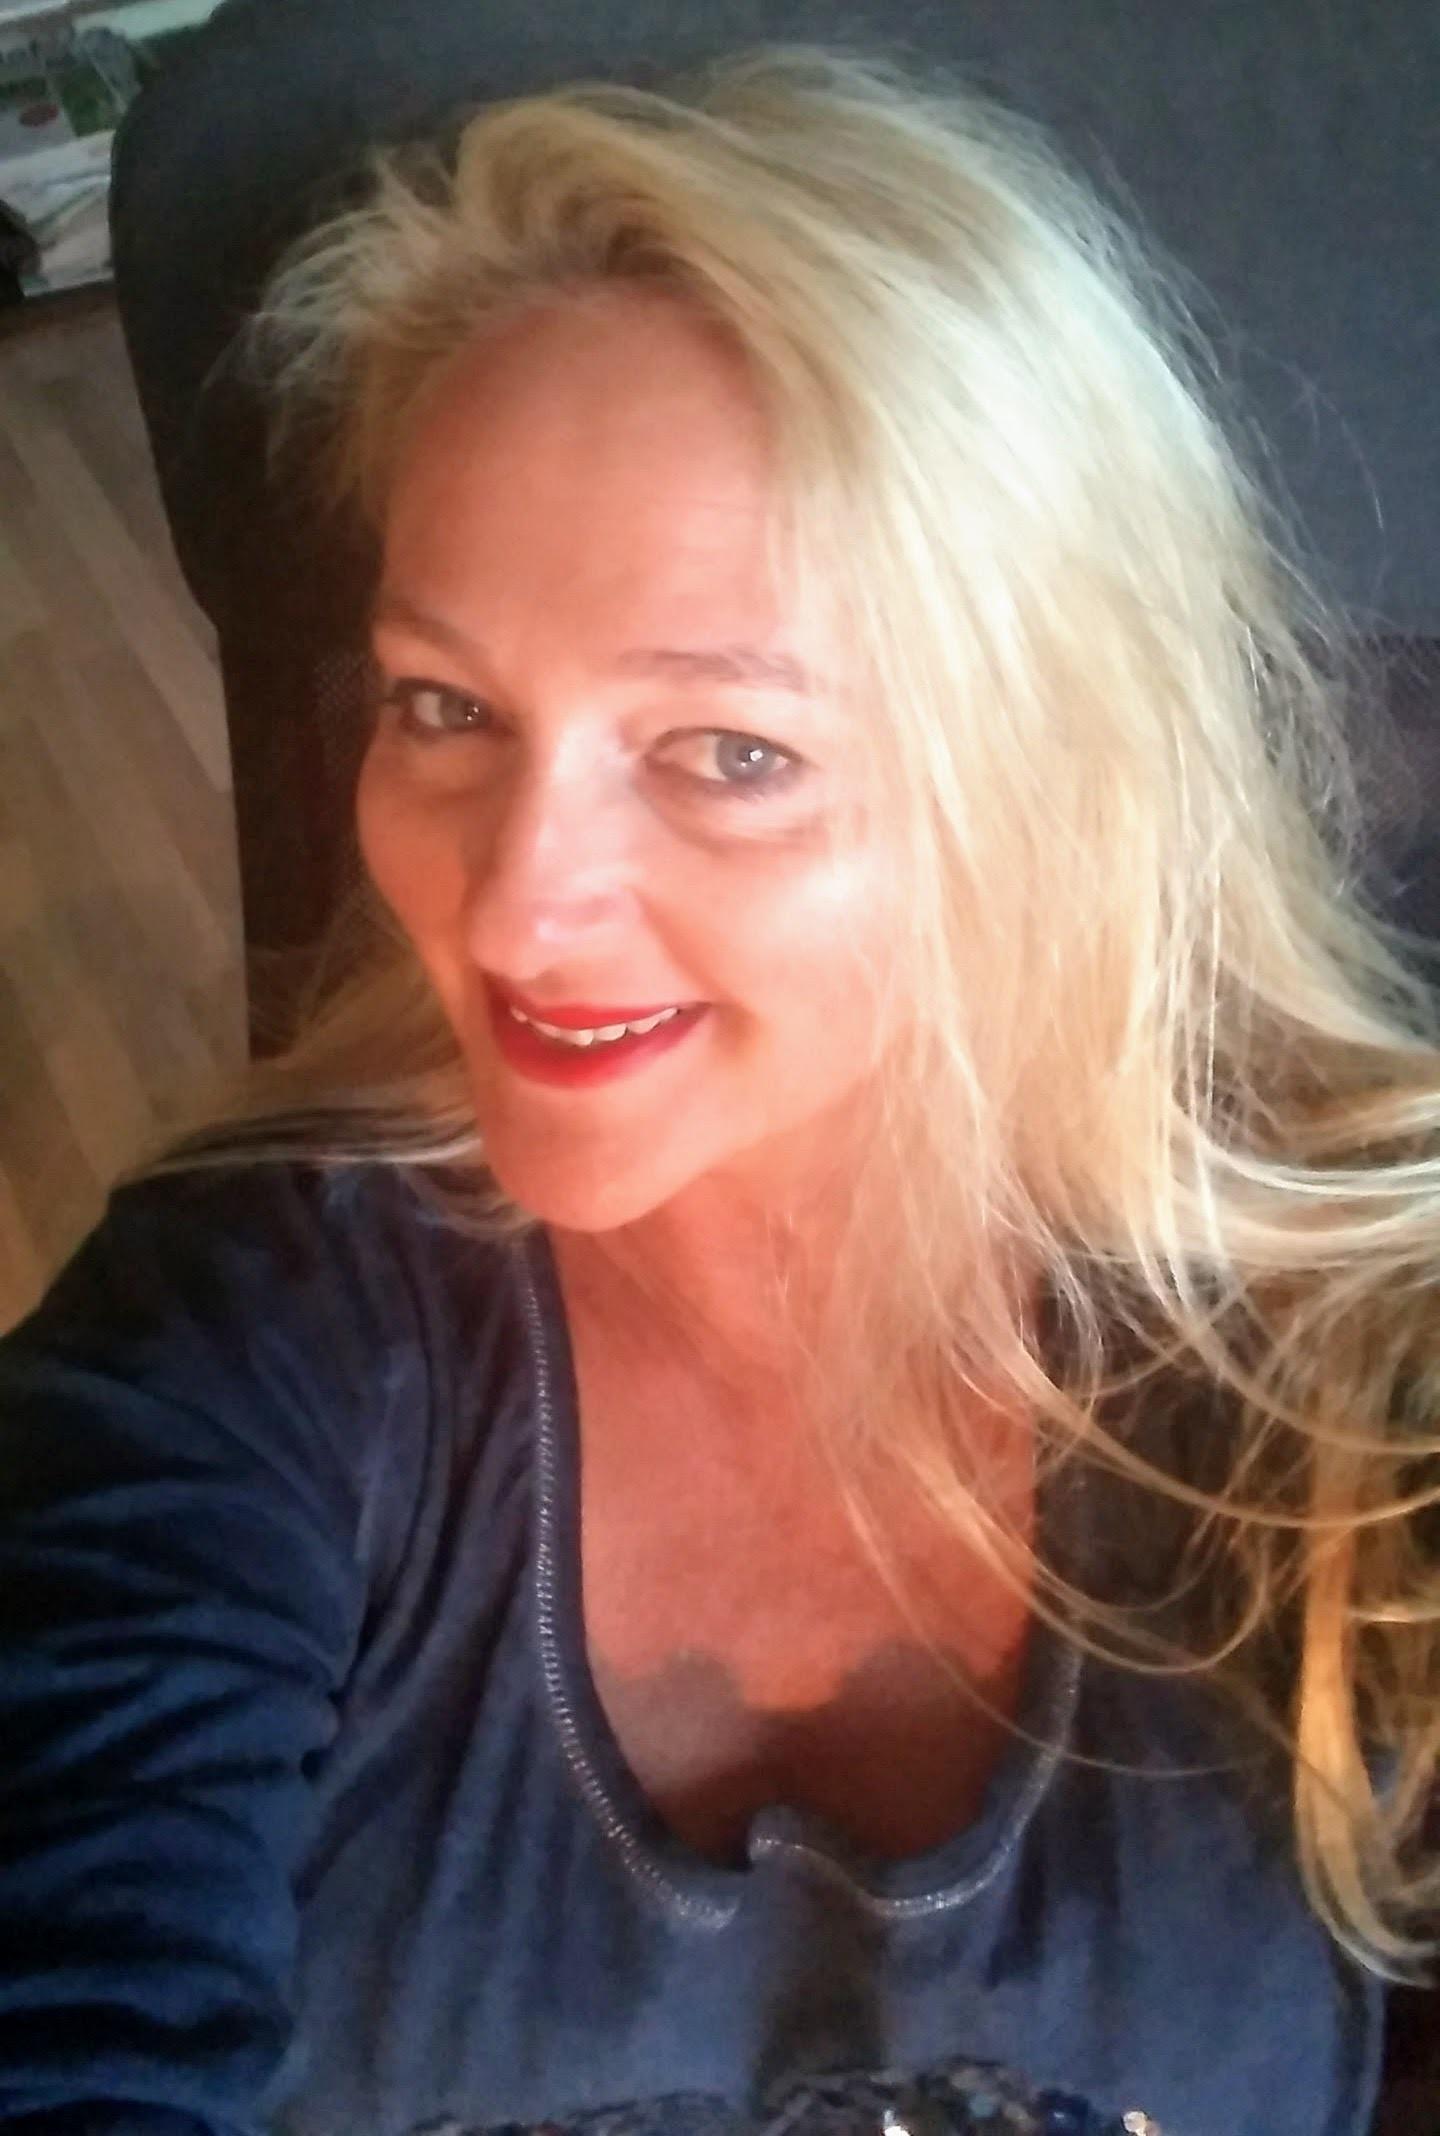 Go to kerstin schmedt's profile